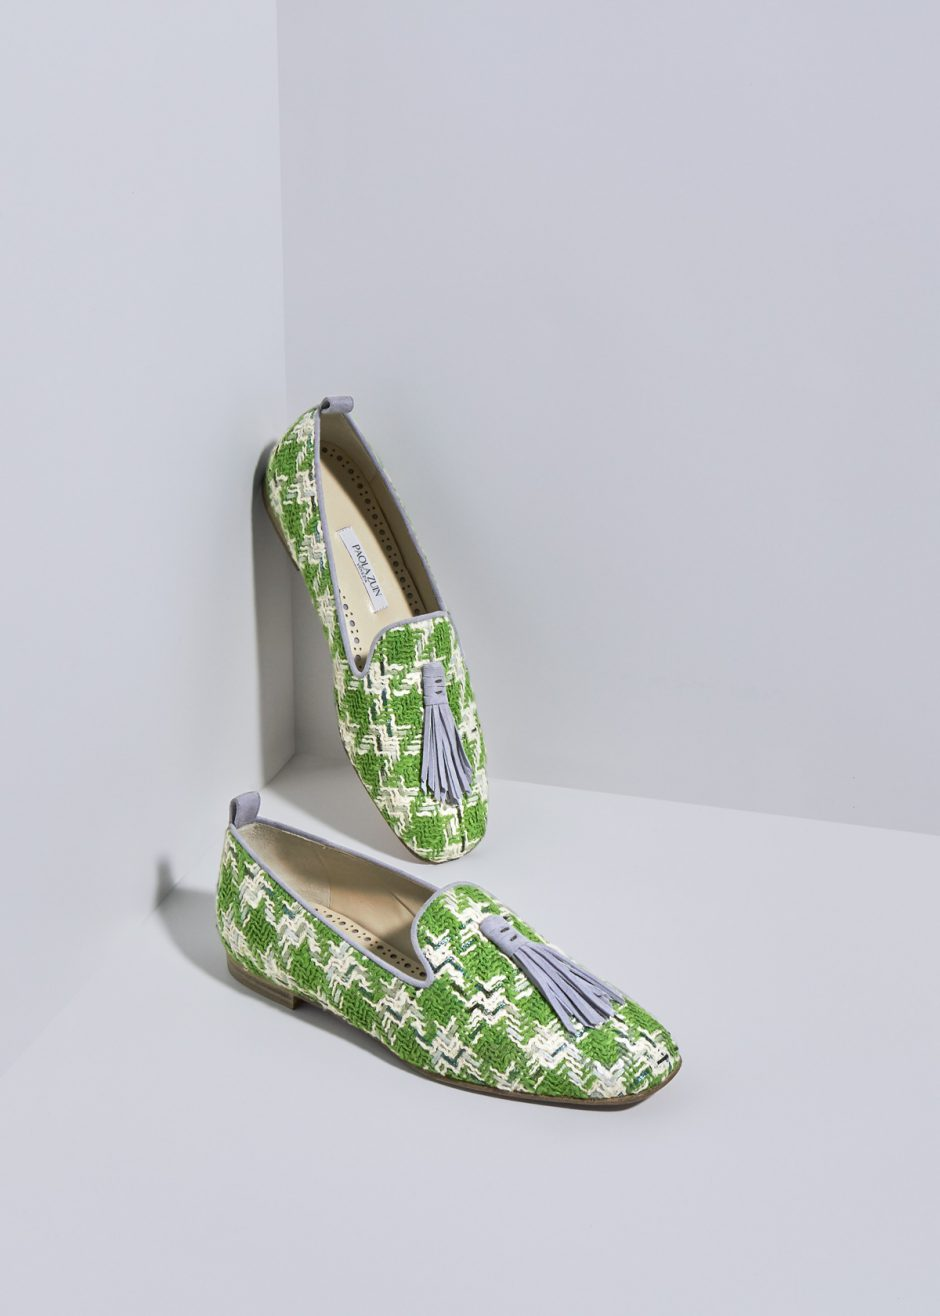 Sveva – Ballet flat Green/ivory houndstooth with grey suede tassel